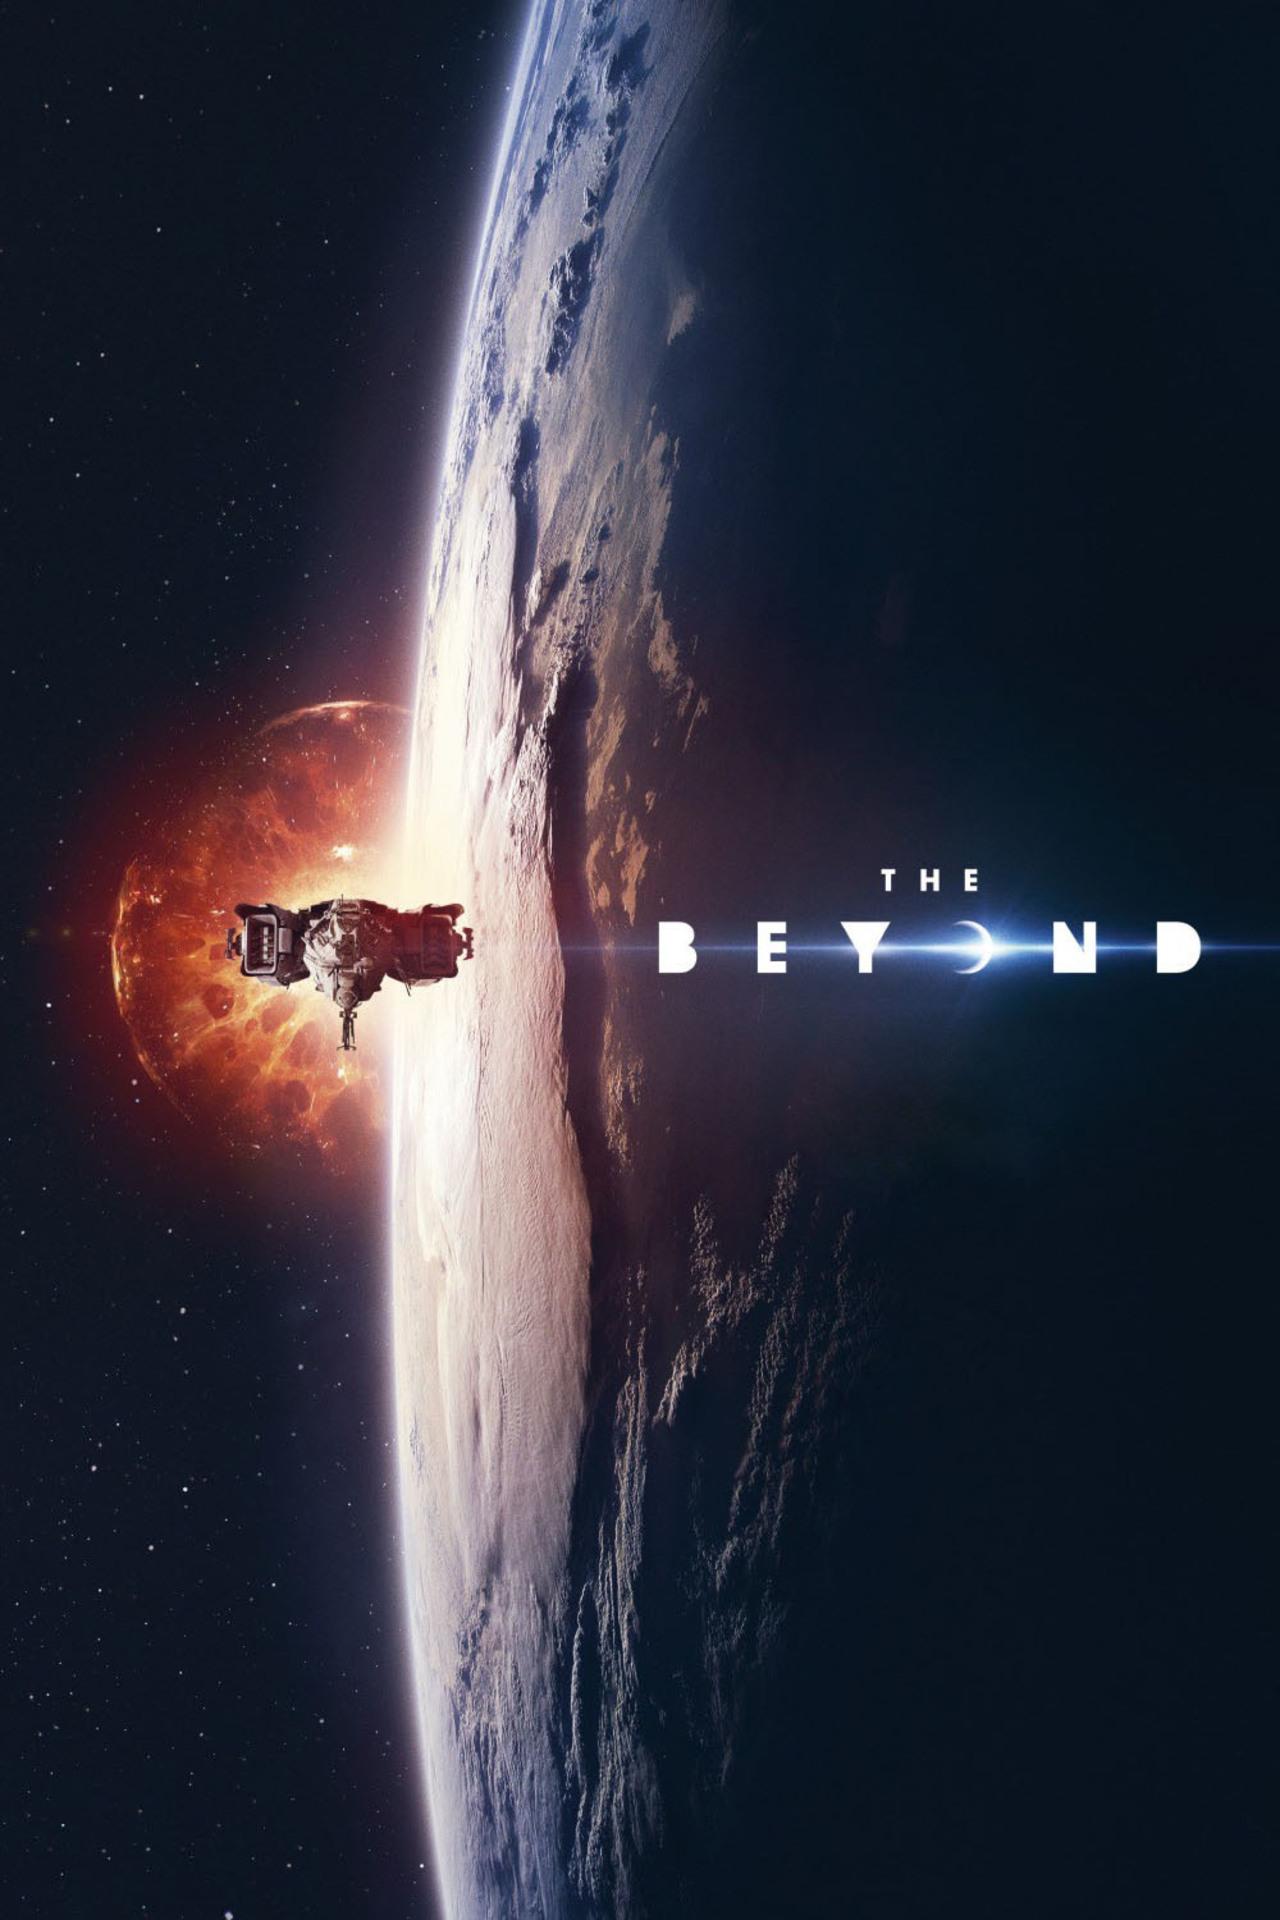 The Beyond kapak